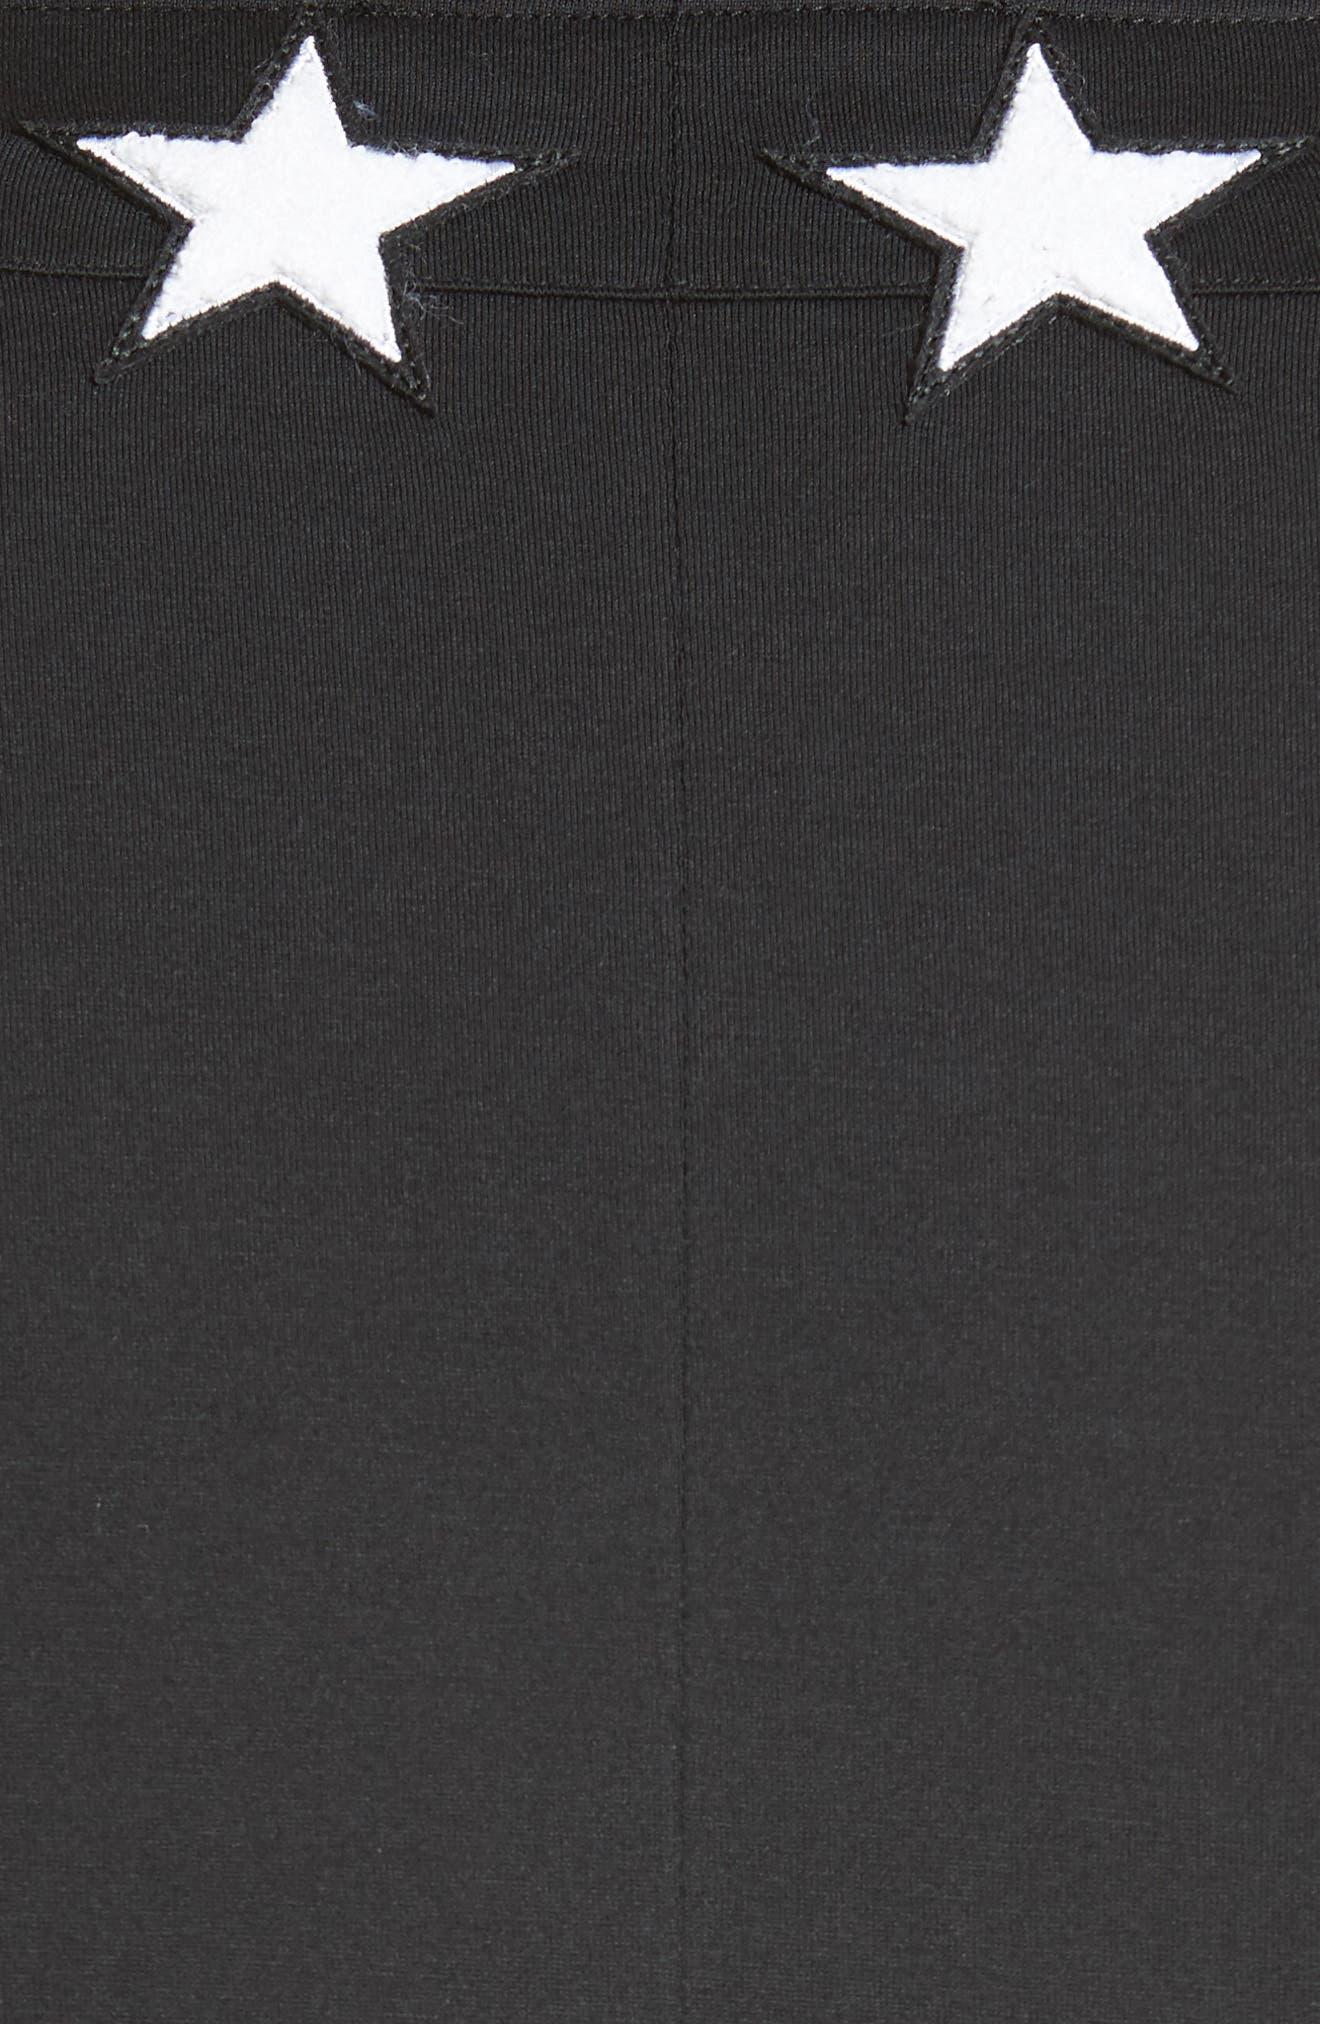 Star 74 T-Shirt,                             Alternate thumbnail 5, color,                             001